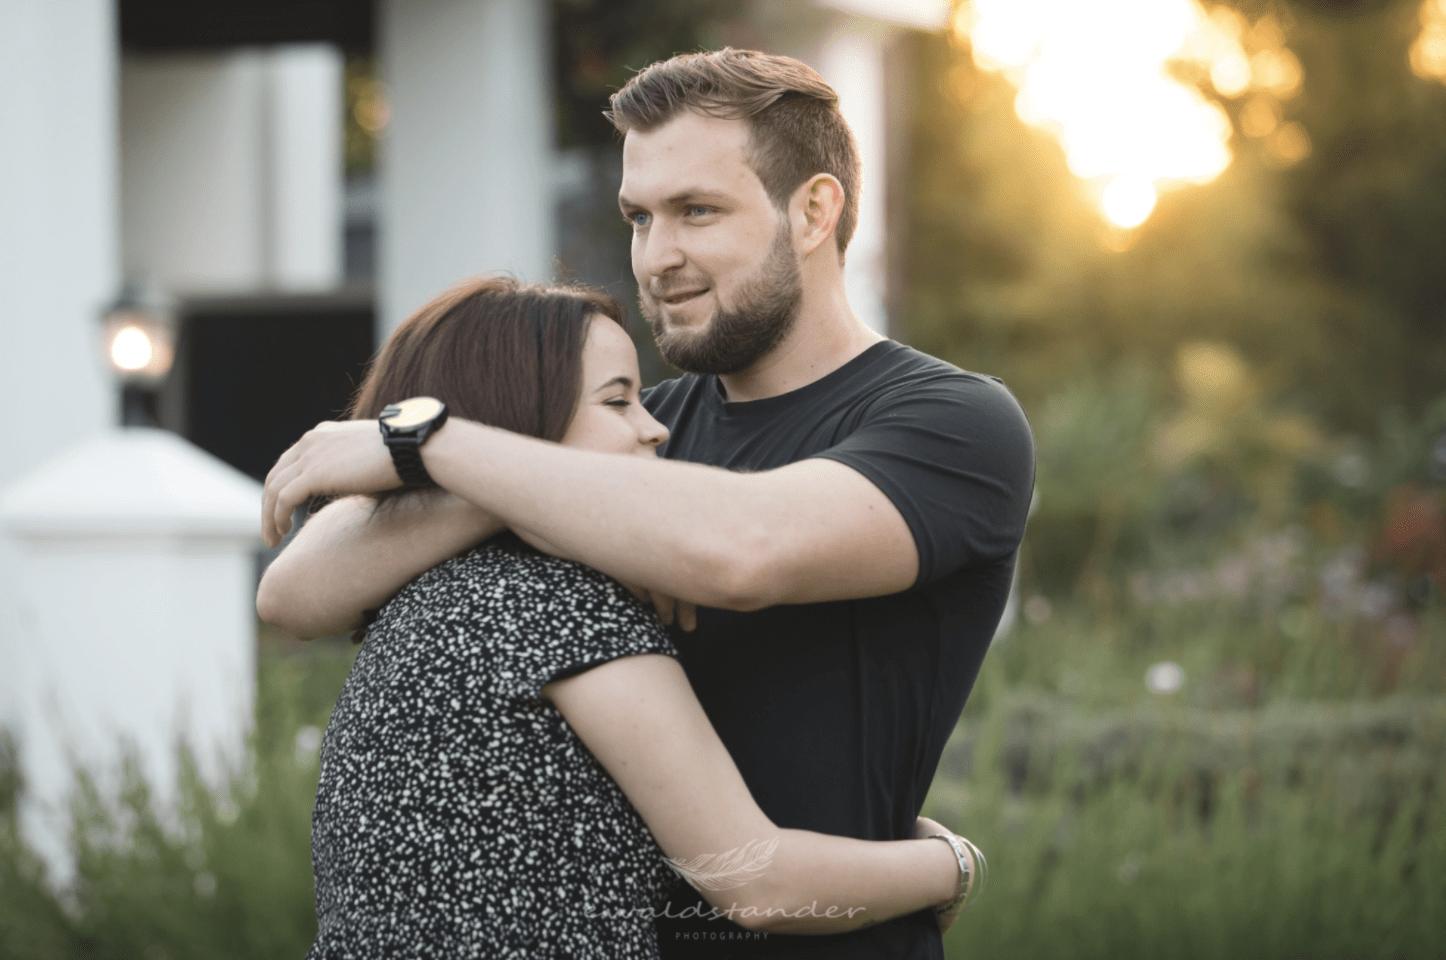 JOHANN AND DANIELLE WINE CELLAR PROPOSAL